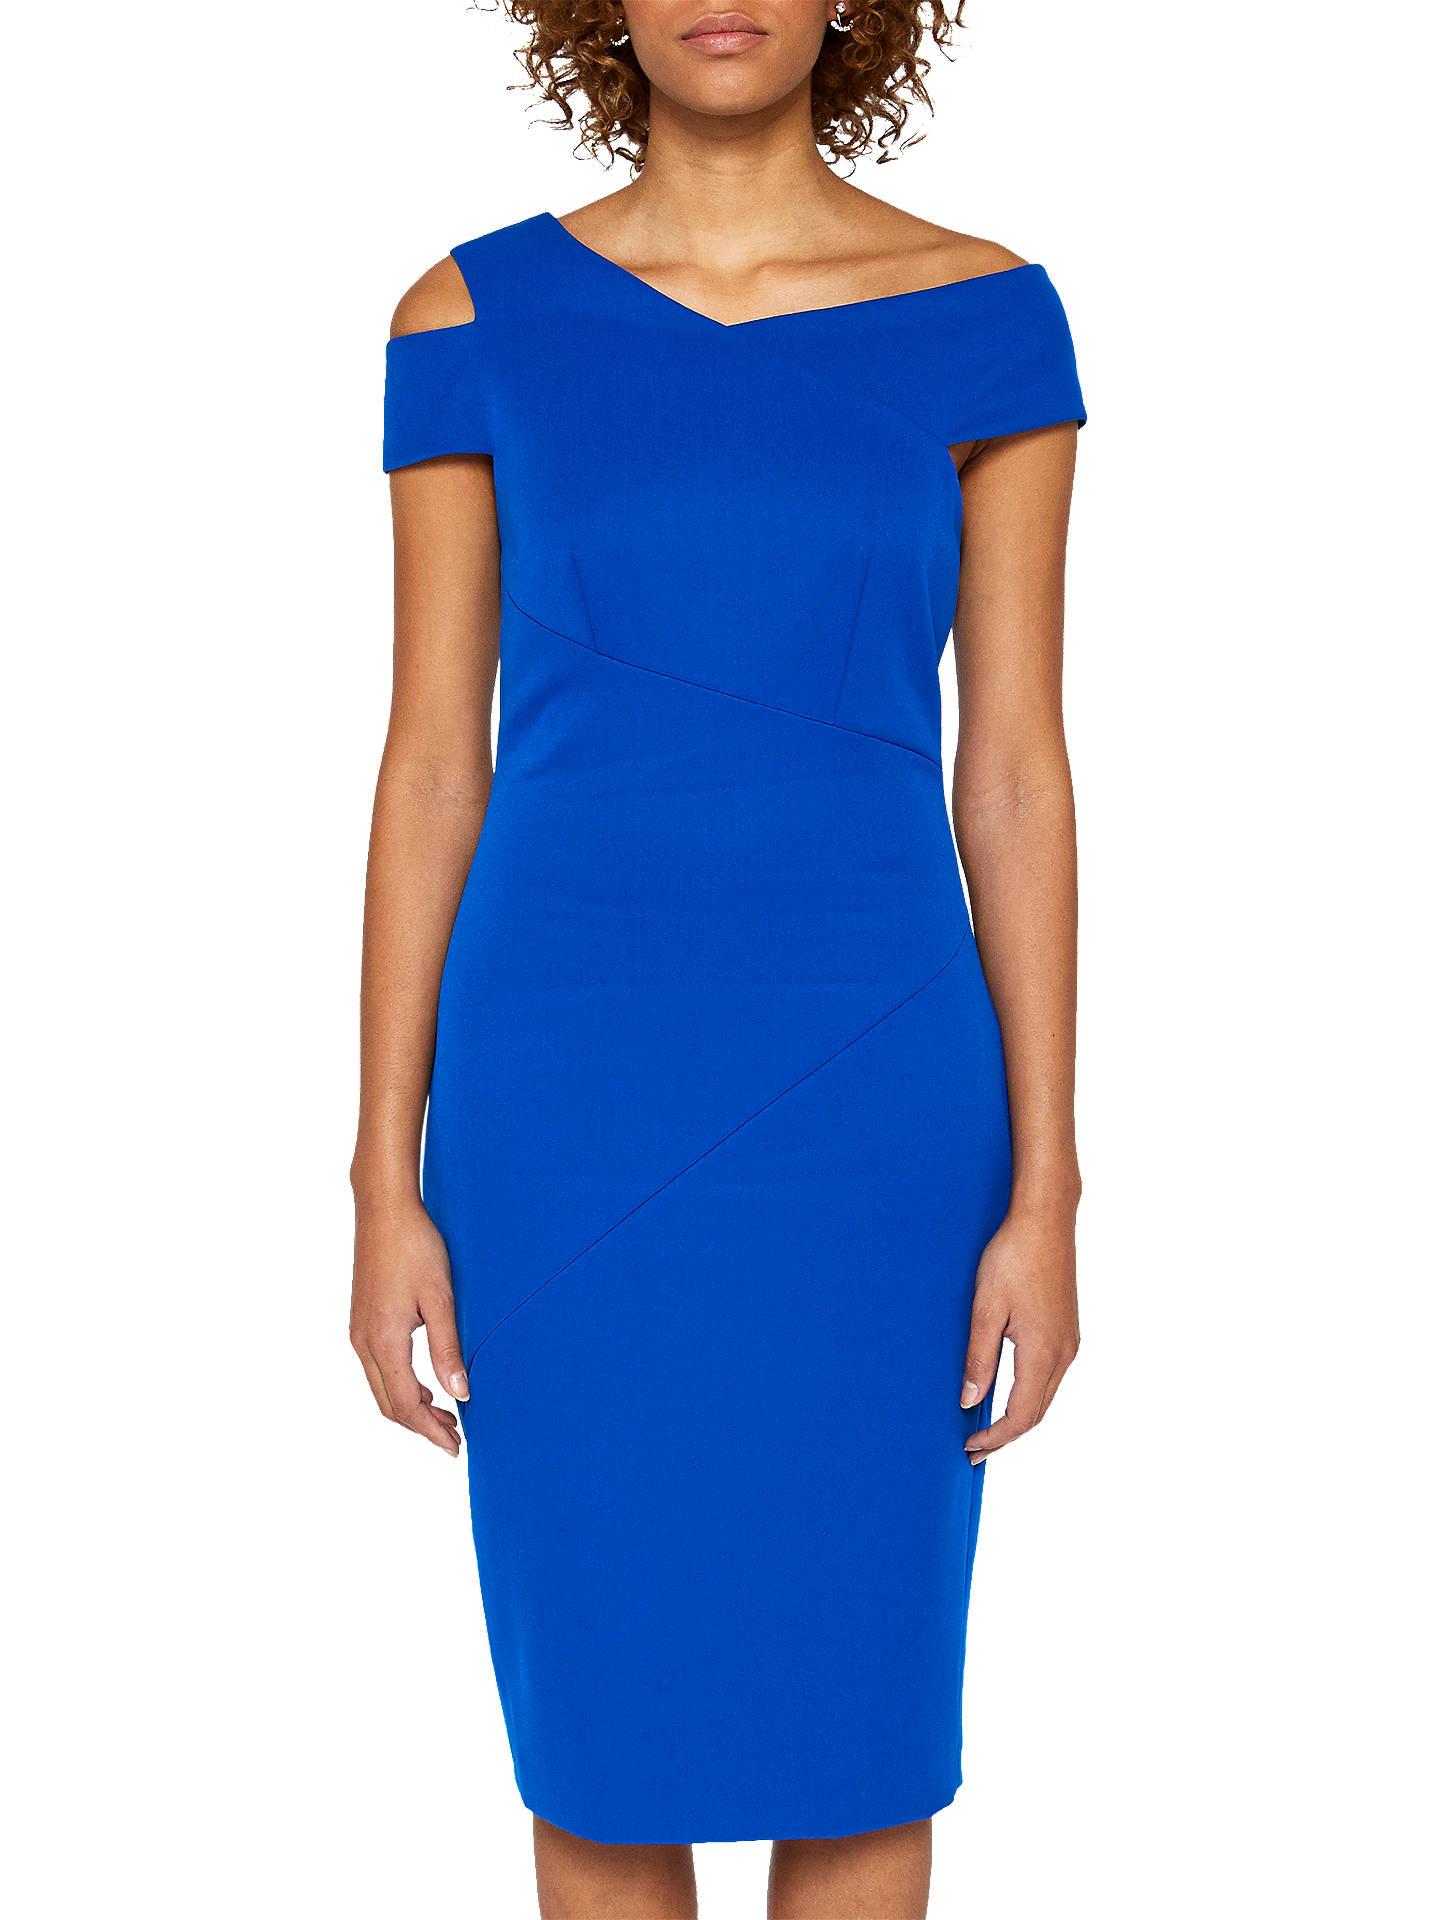 c40f65036efd Buy Ted Baker Yandal Asymmetric Bodycon Dress